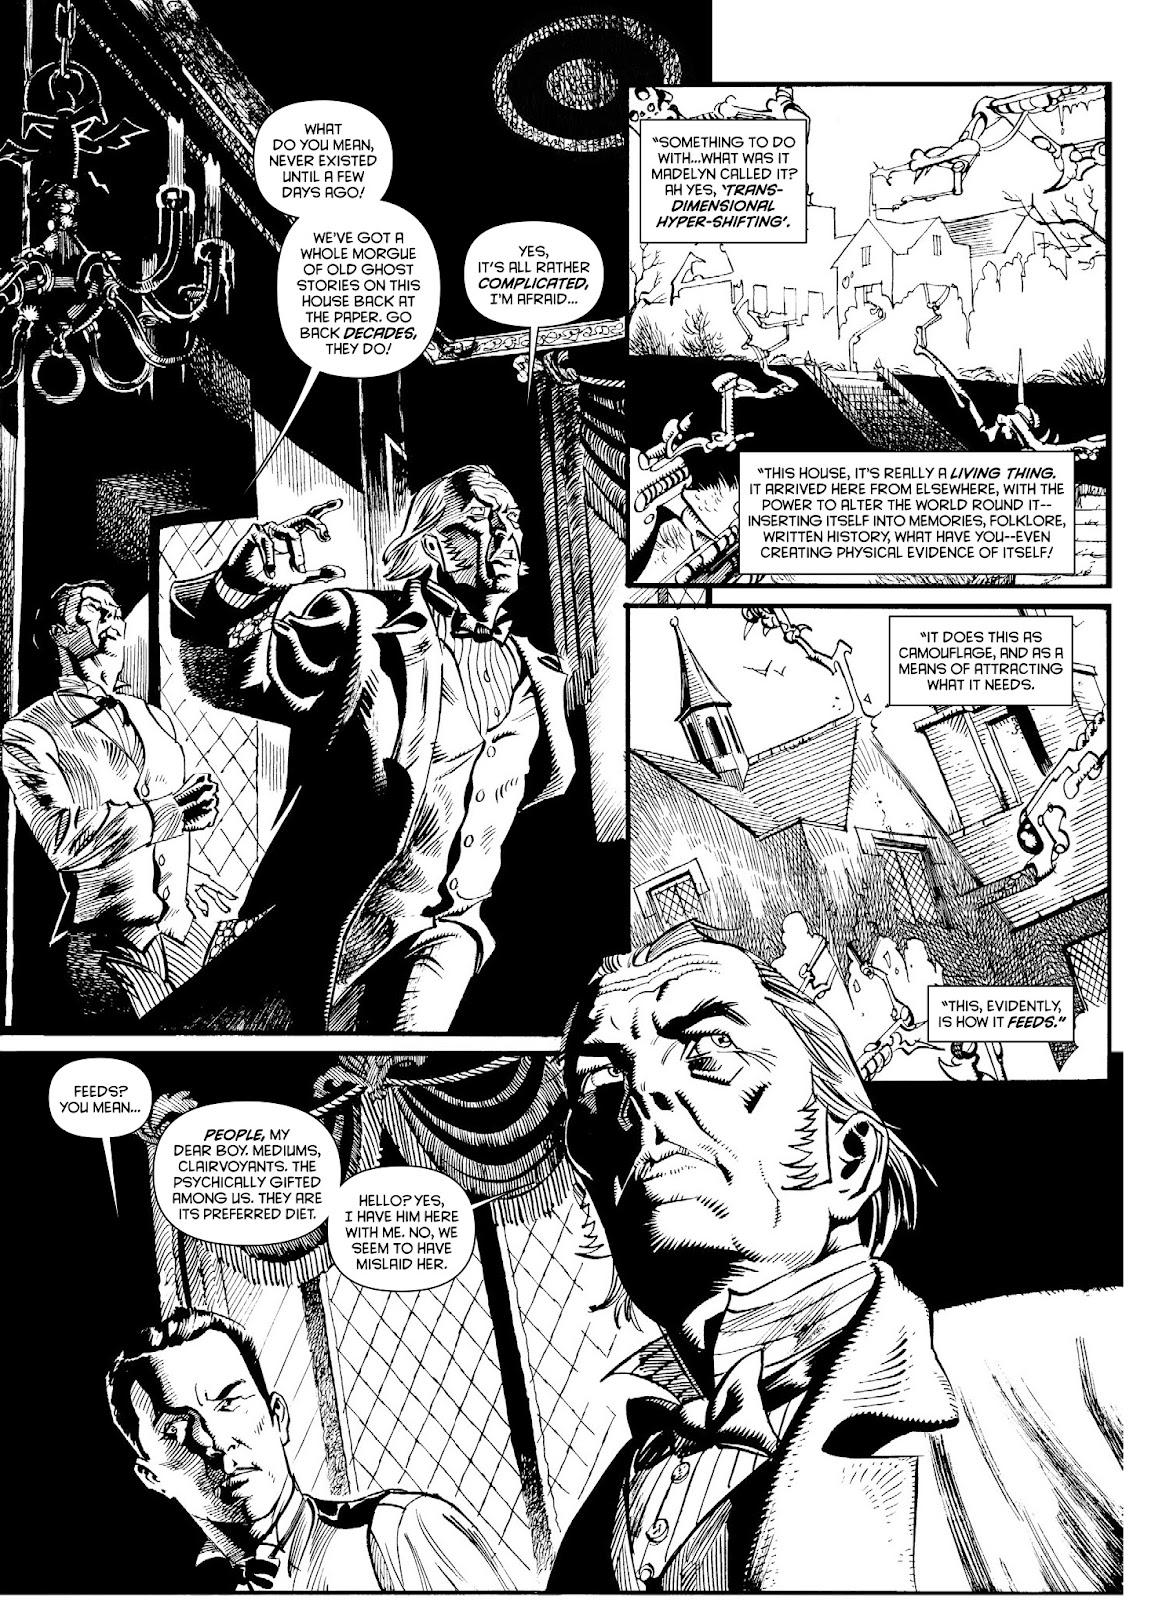 Judge Dredd Megazine (Vol. 5) issue 427 - Page 99